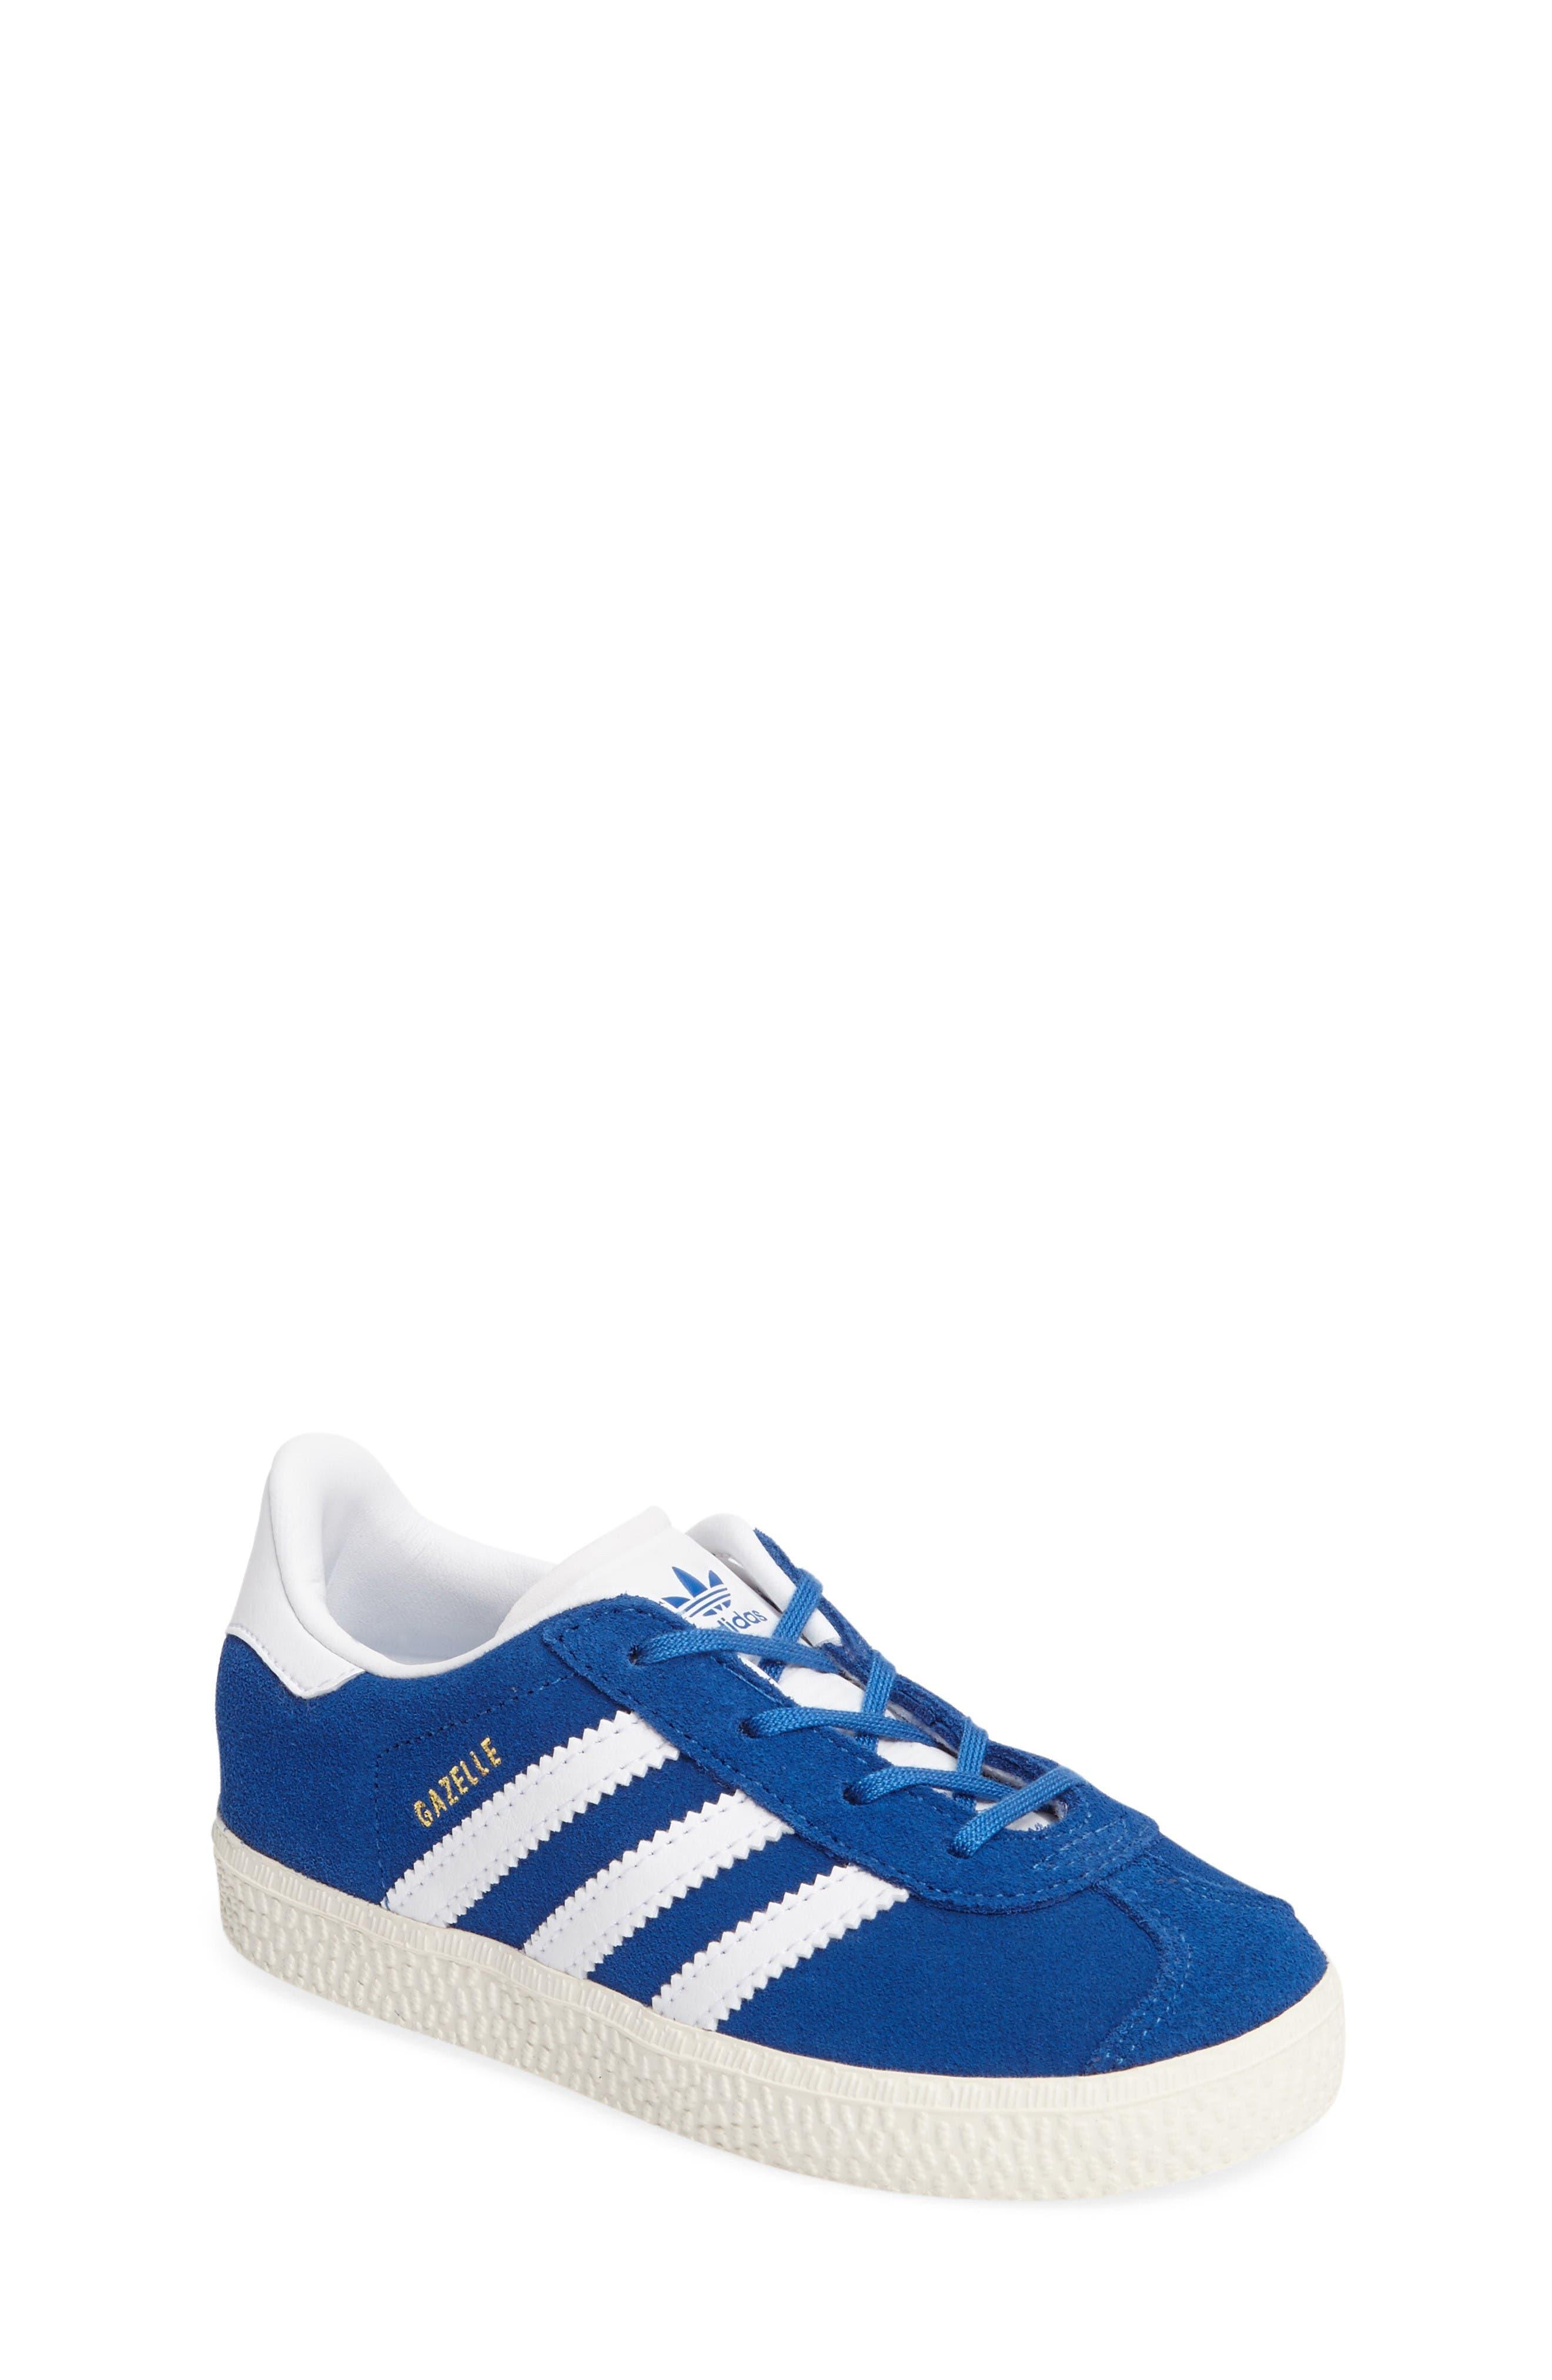 Gazelle Sneaker,                             Main thumbnail 1, color,                             Blue/ White/ Gold Metallic